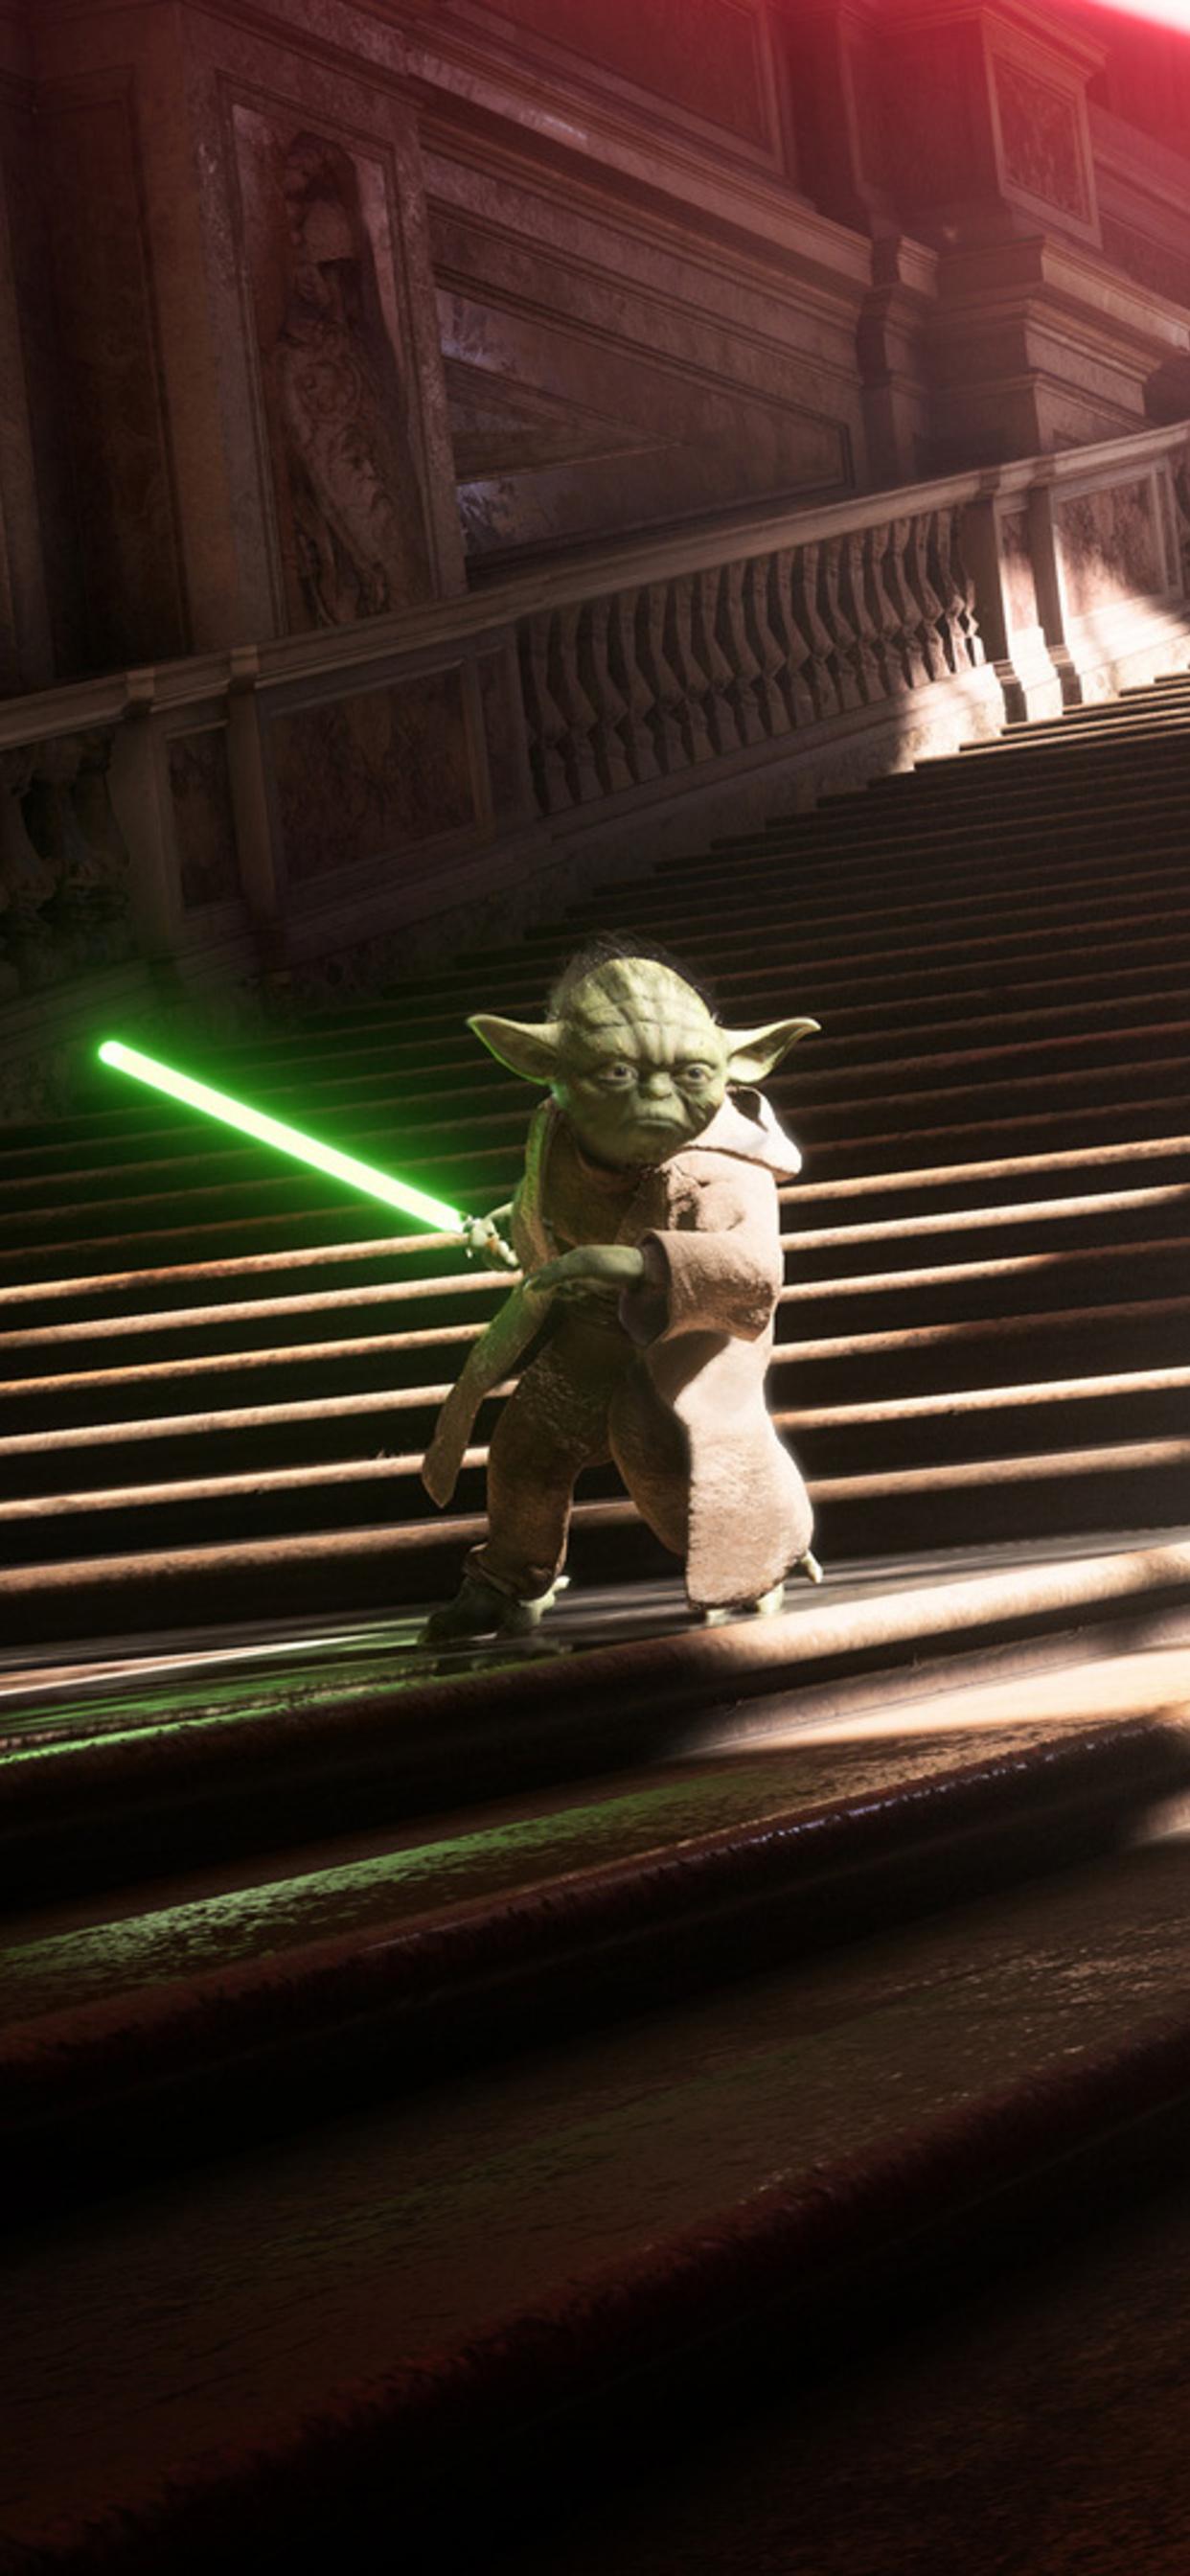 1242x2688 Yoda Vs Darth Vader Star Wars Battlefront 2 Iphone